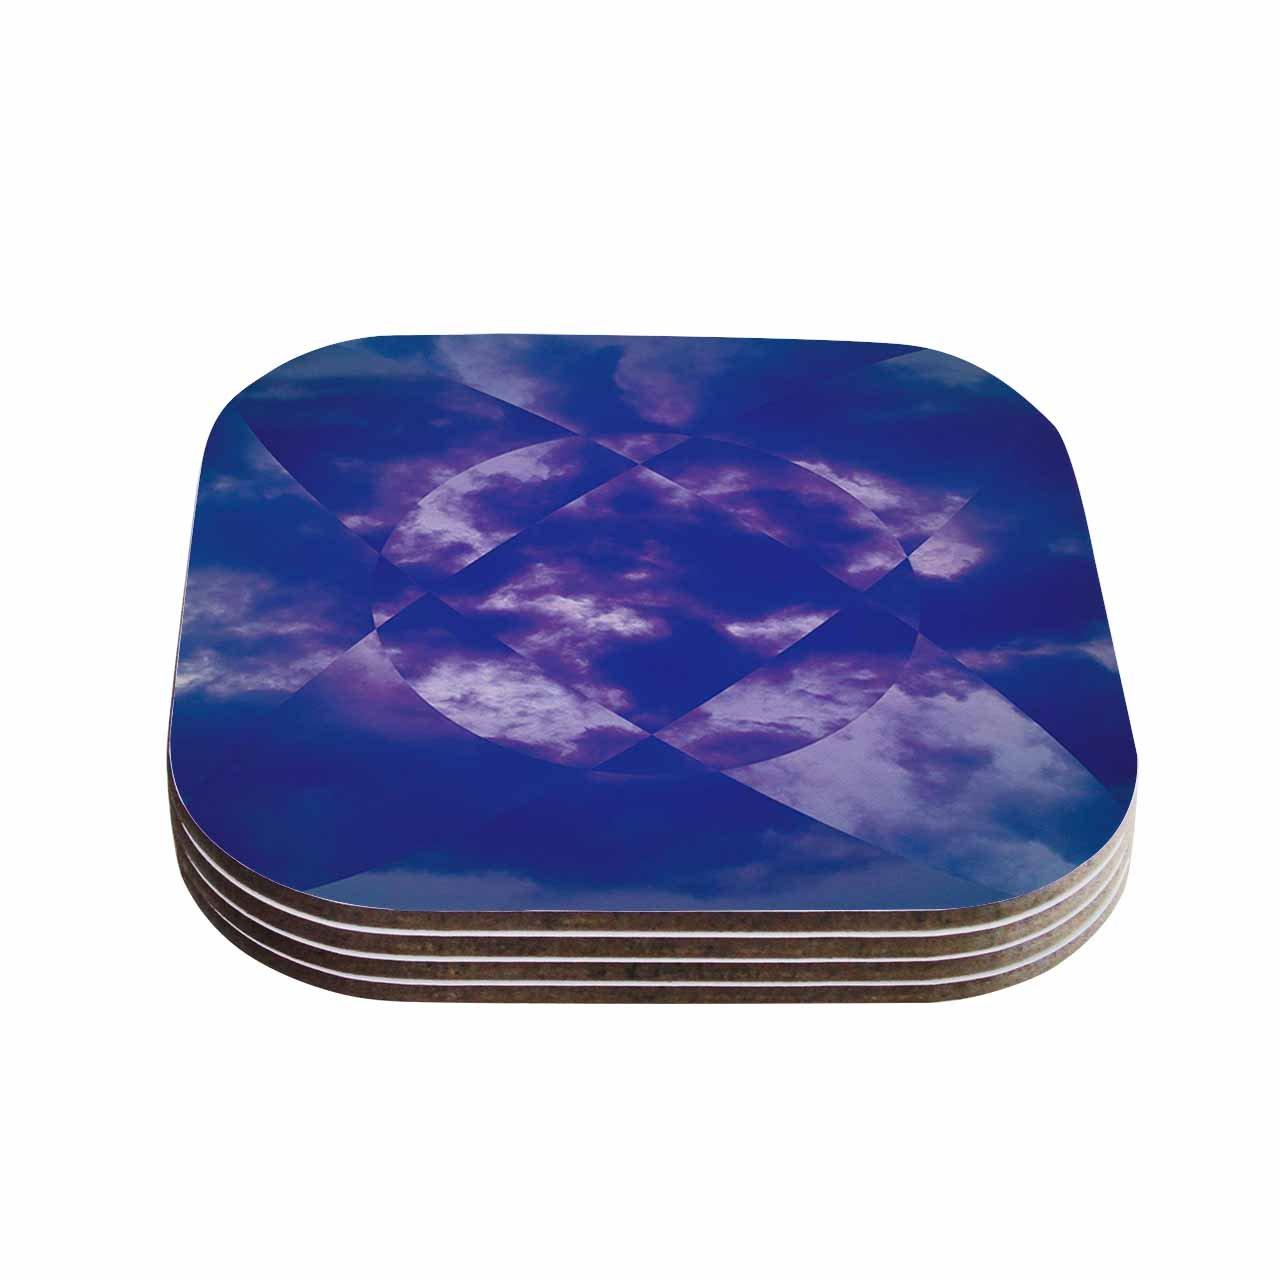 Multicolor 4 x 4 KESS InHouse Matt EklundSpectral Purple Blue Coasters Set of 4